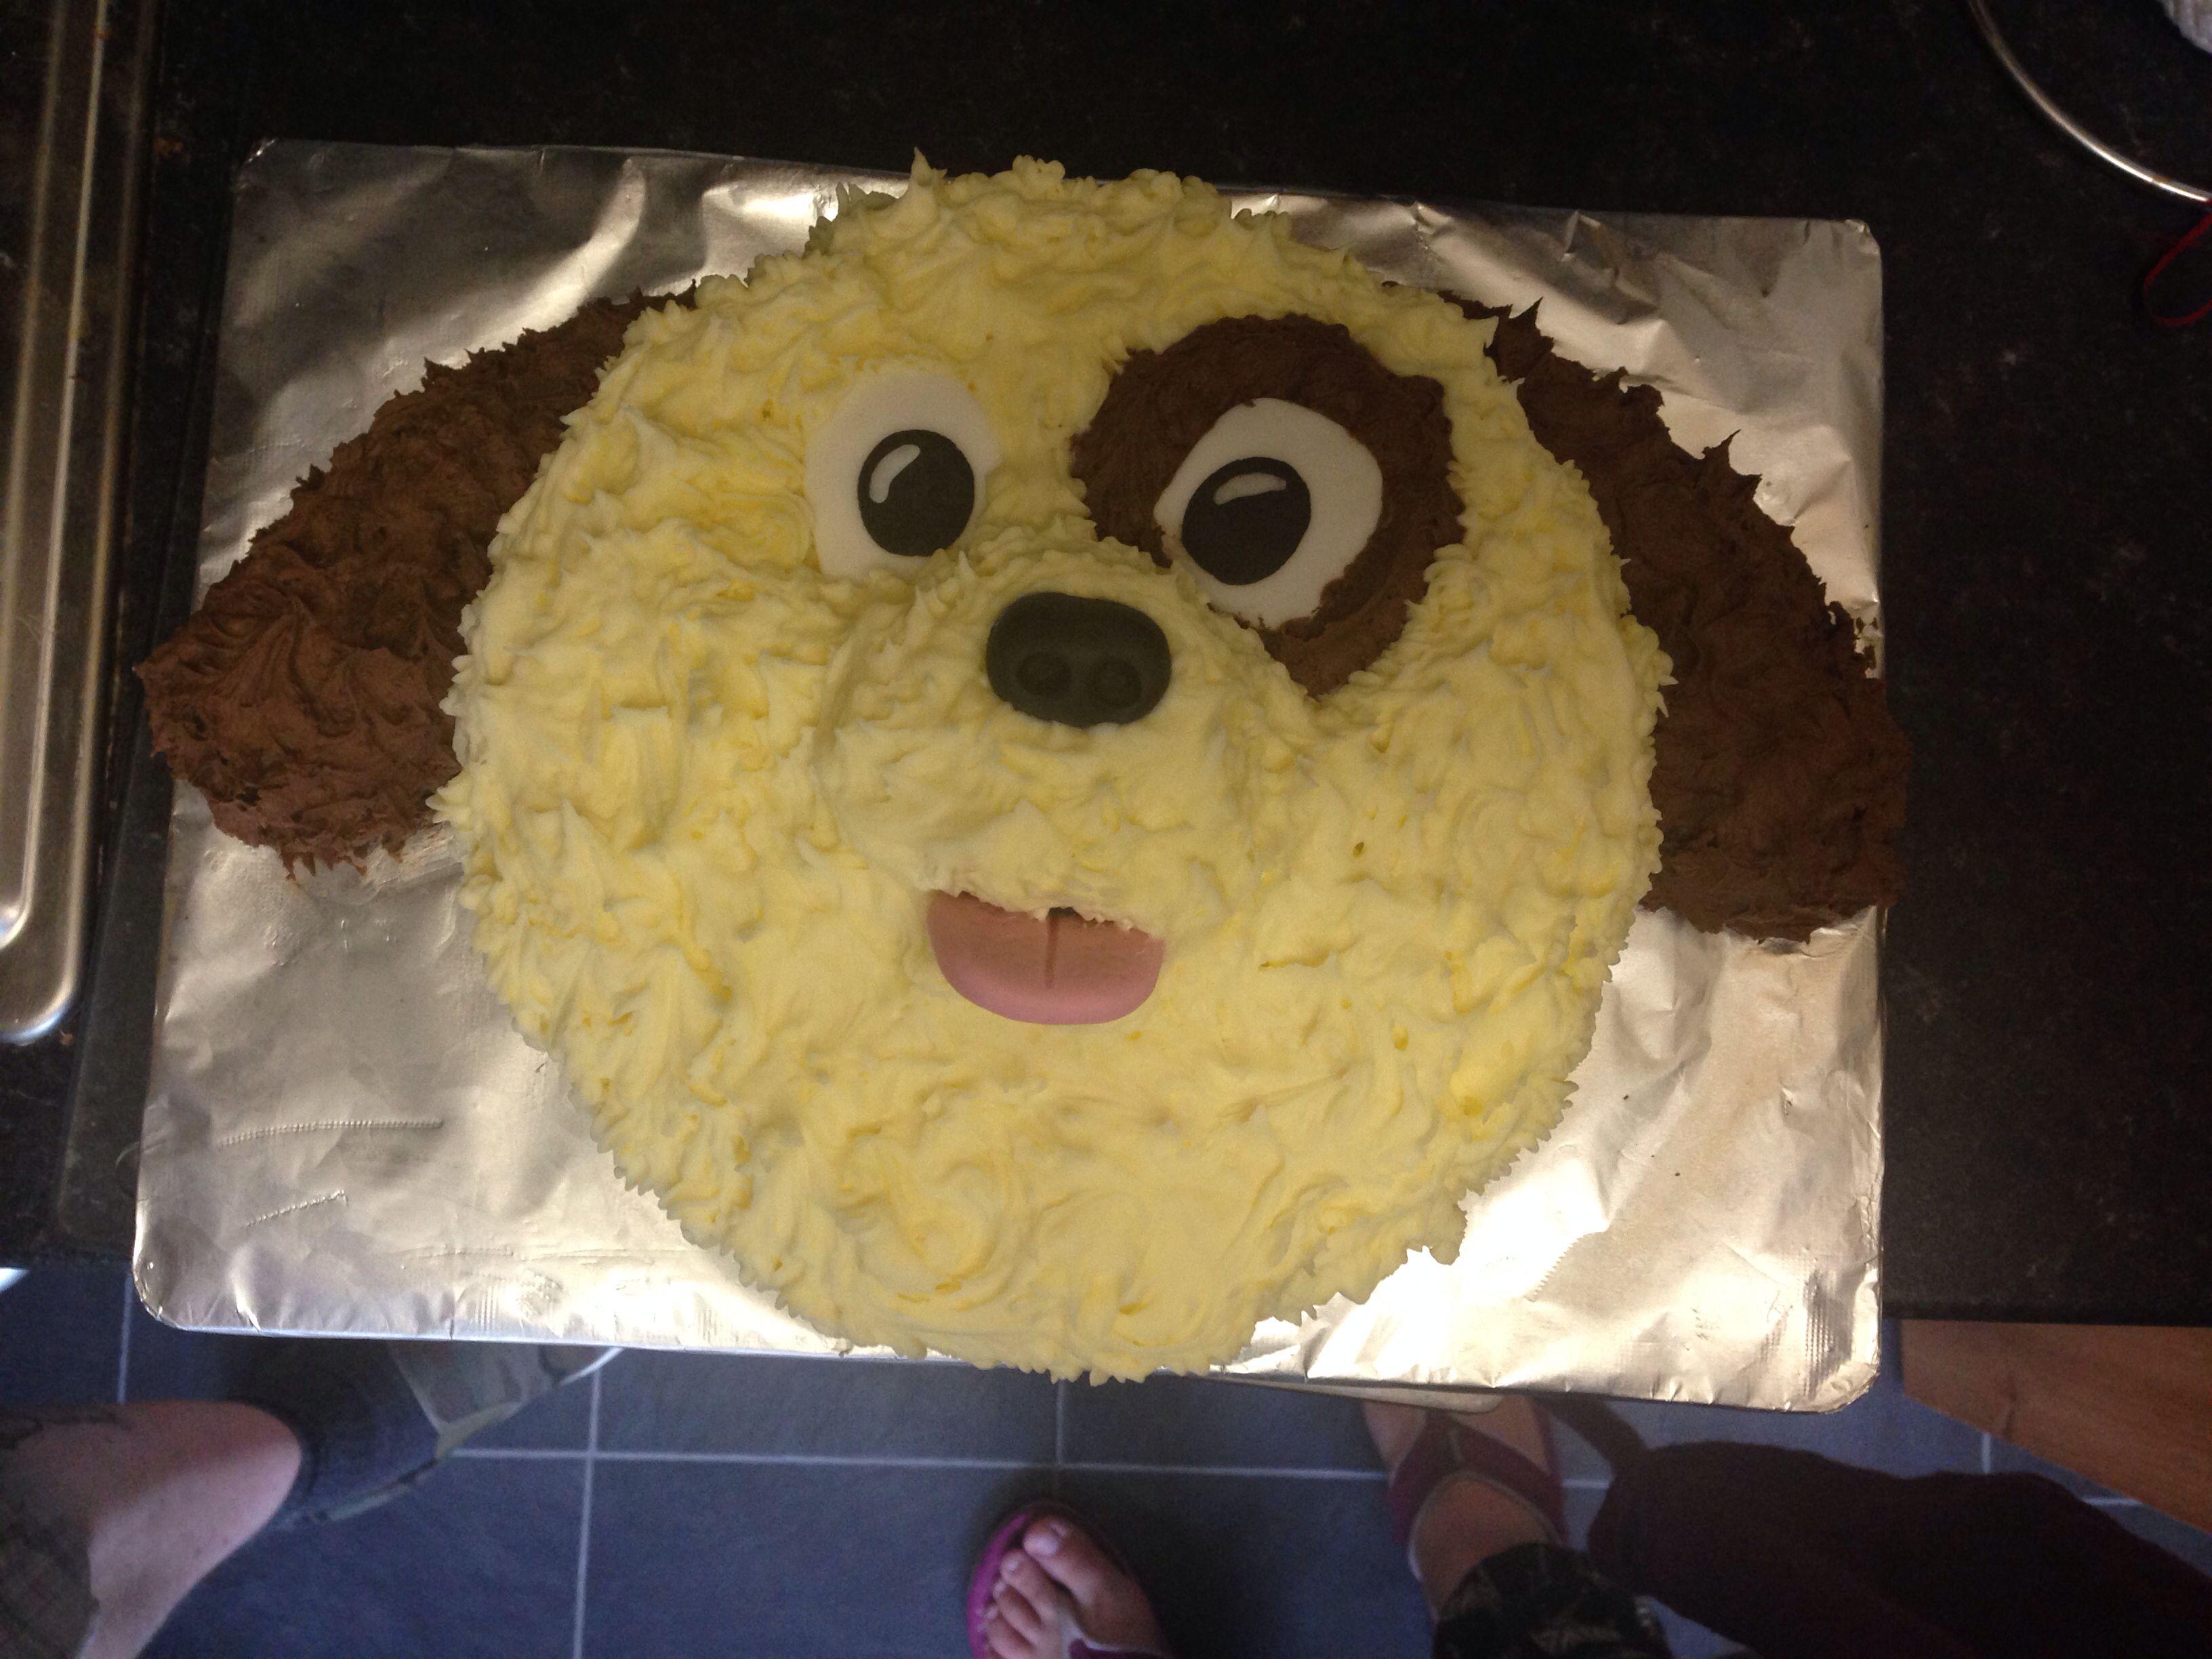 Birthday Cake I Made Buttercream Dog Face Things I Have Baked